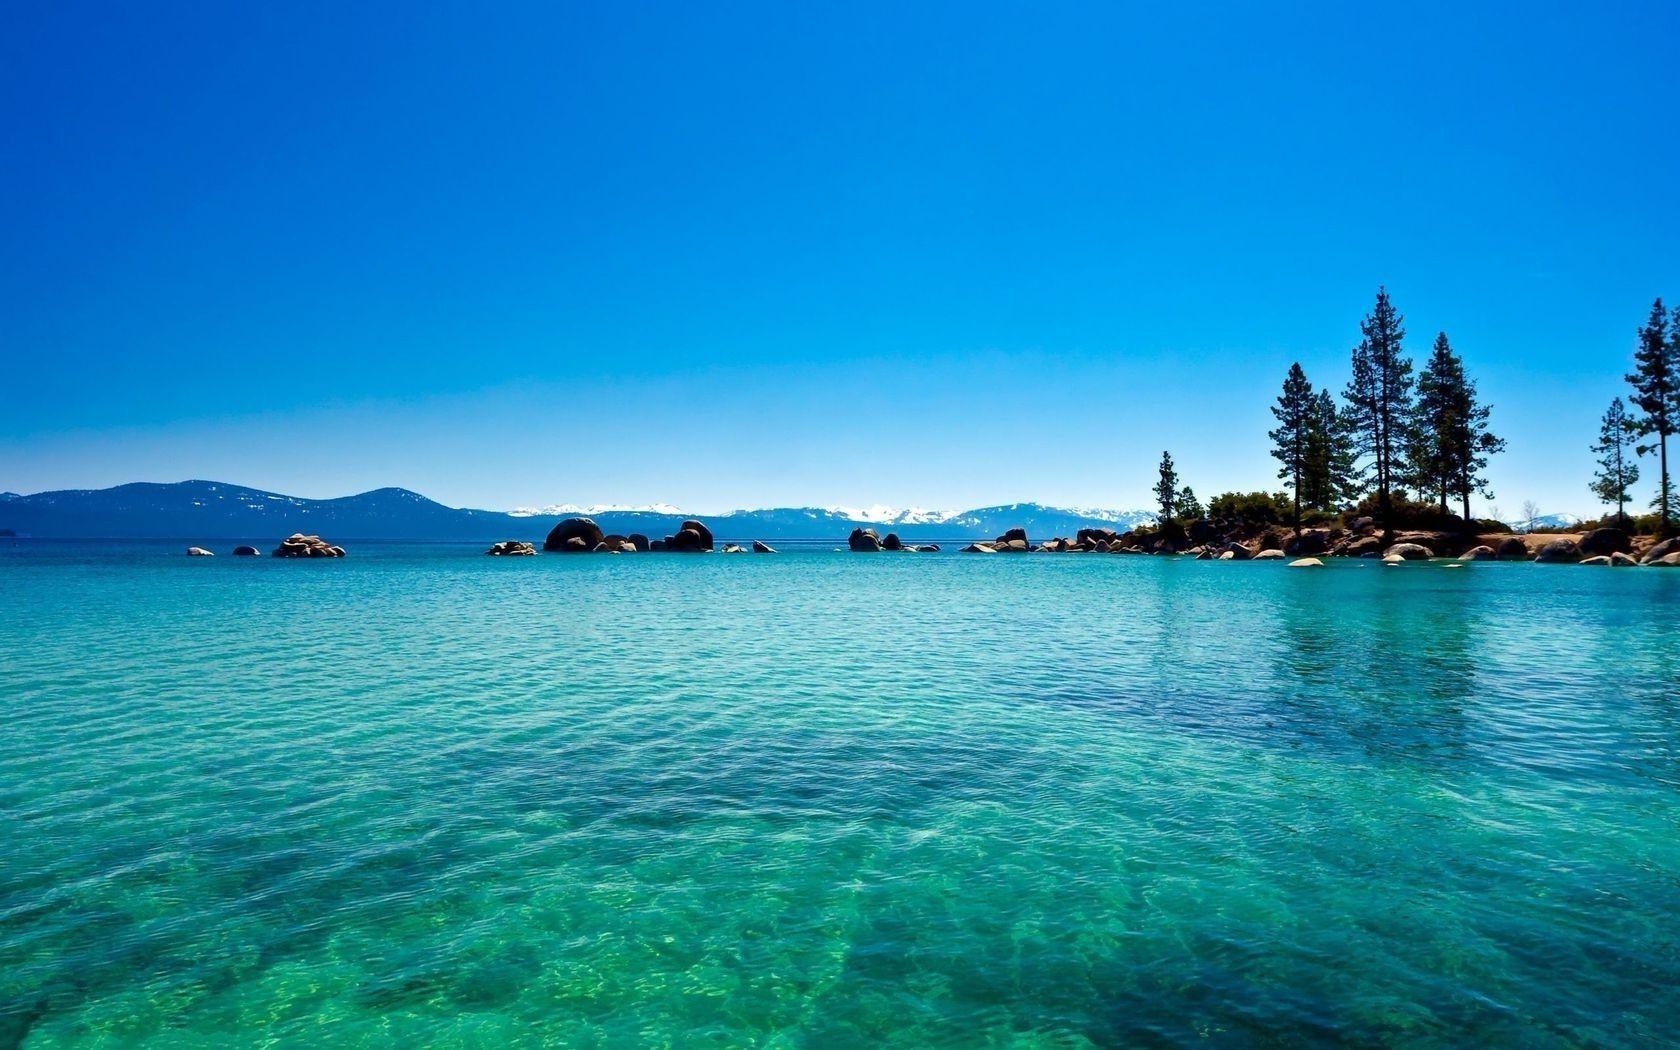 Lake tahoe california blue water lake forest - Phone wallpapers